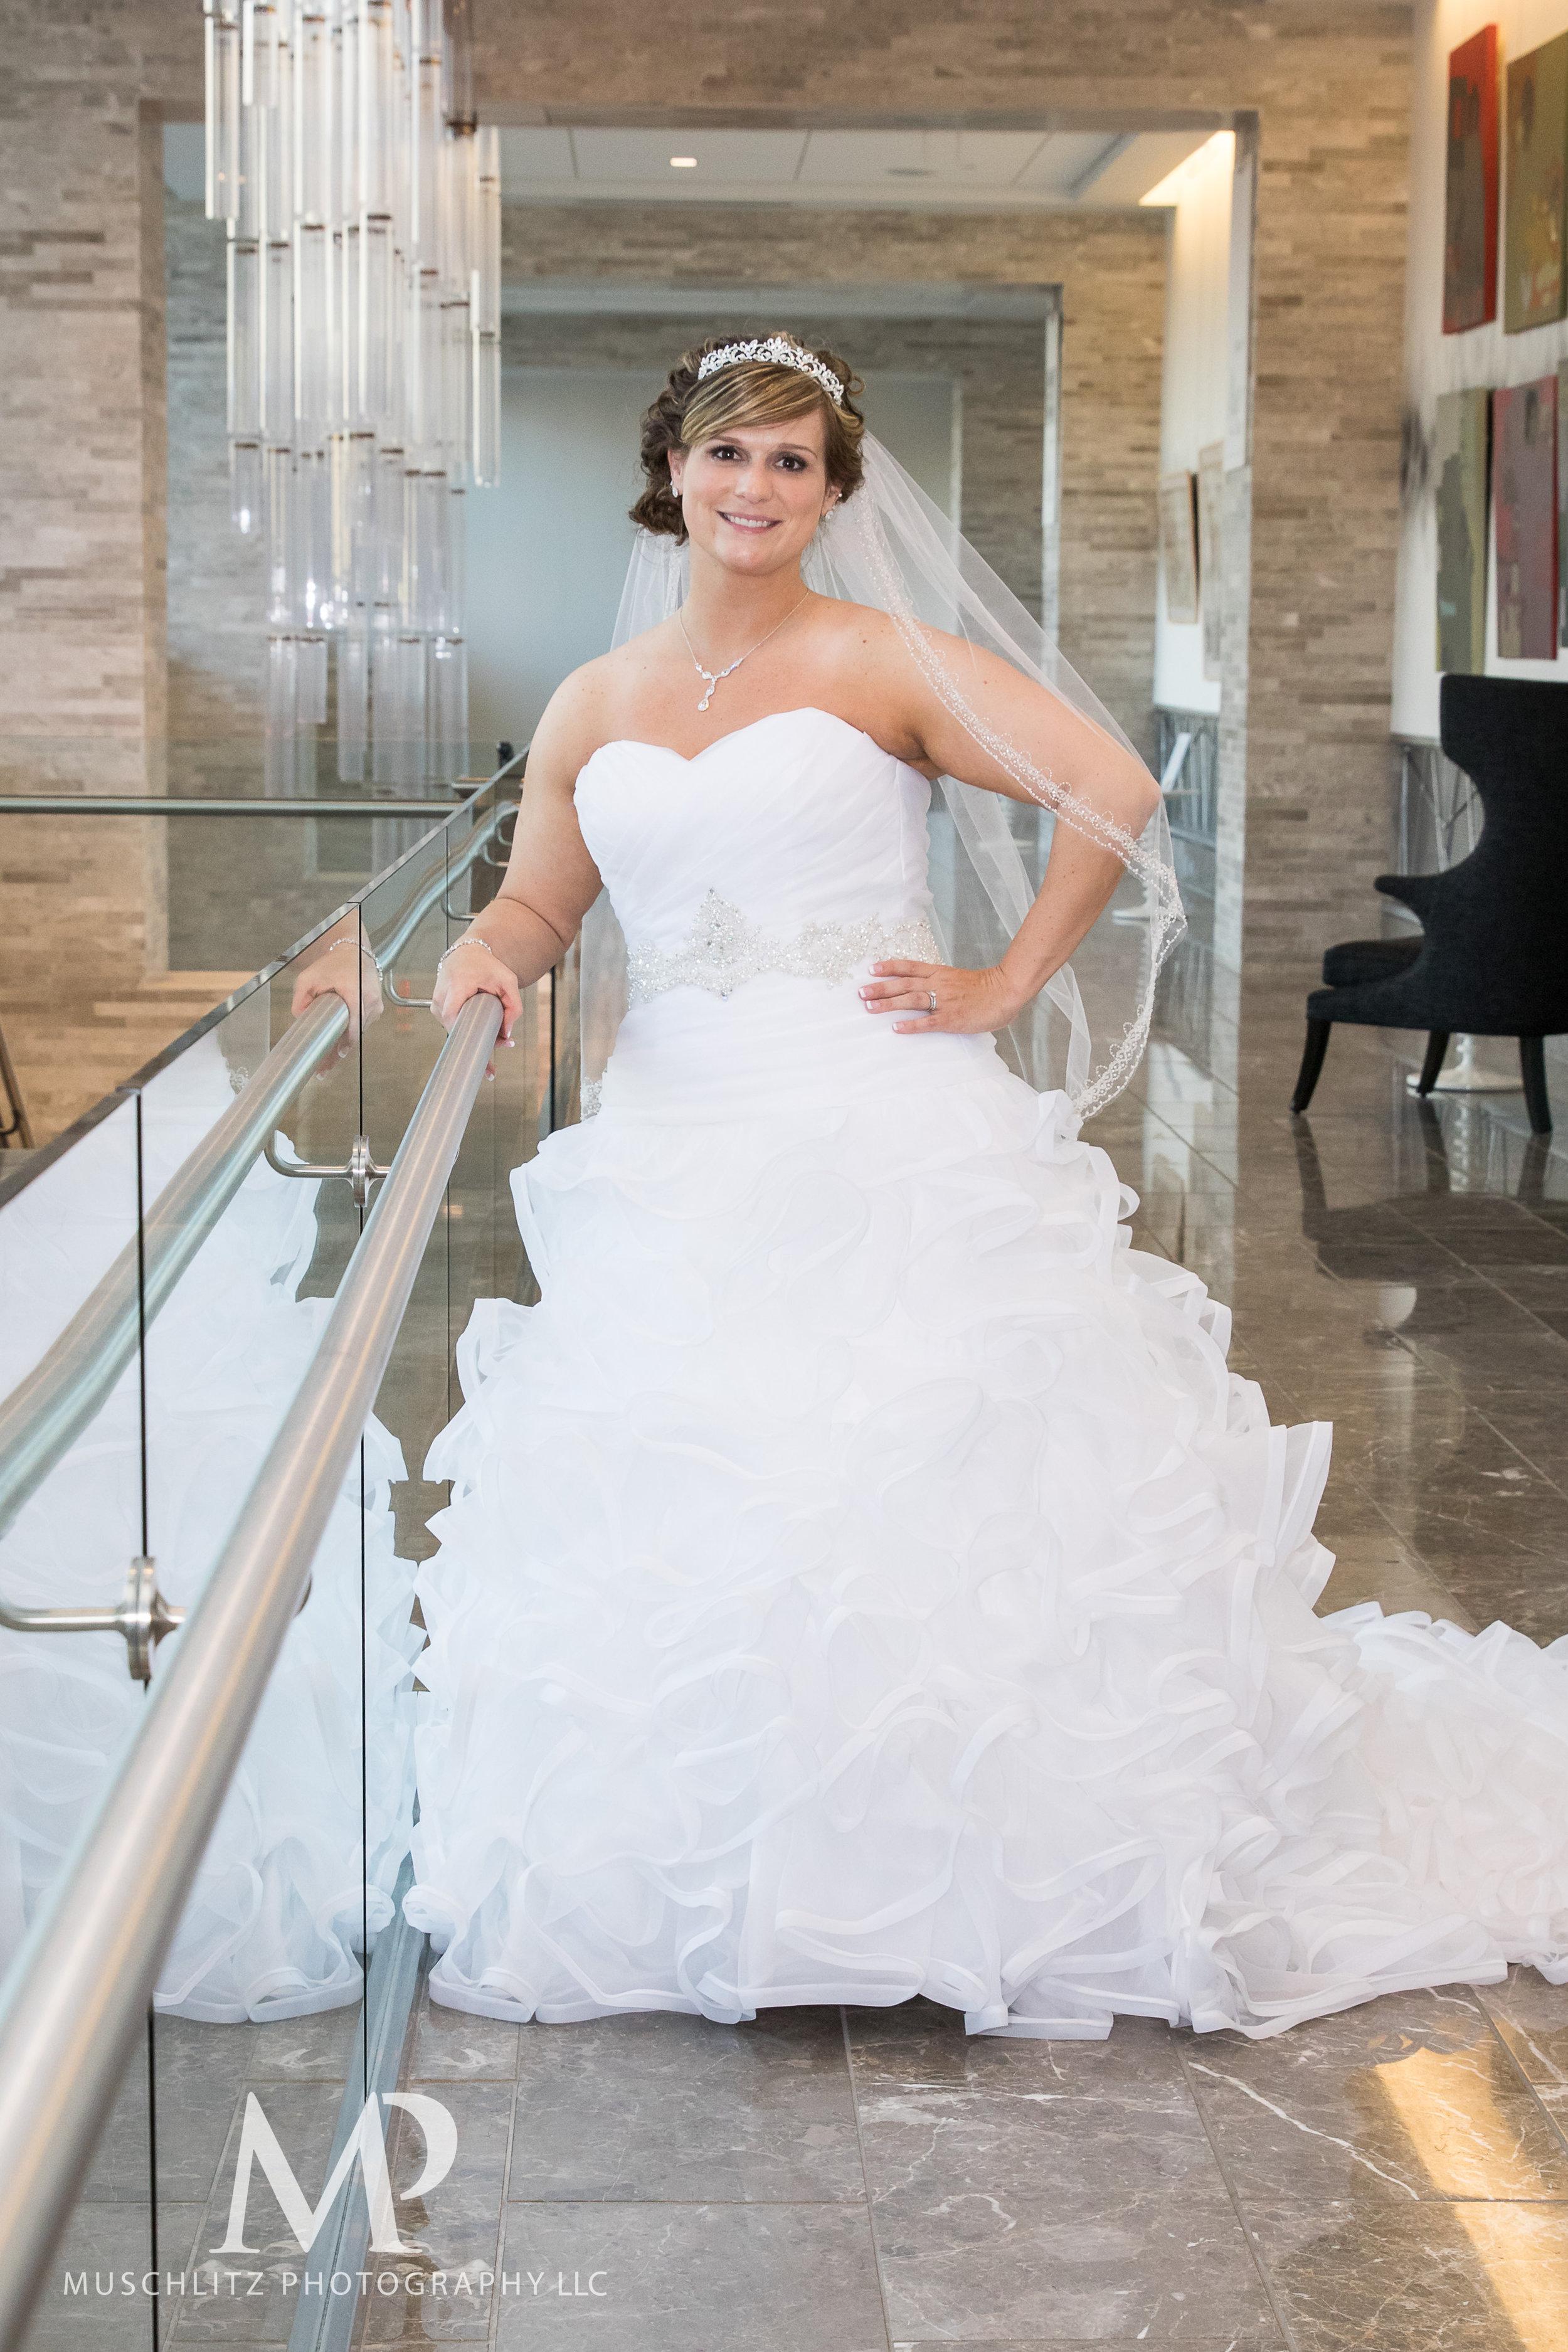 the hilton-columbus-wedding-portraits-downtown-columbus-ohio-muschlitz-photography-009.JPG